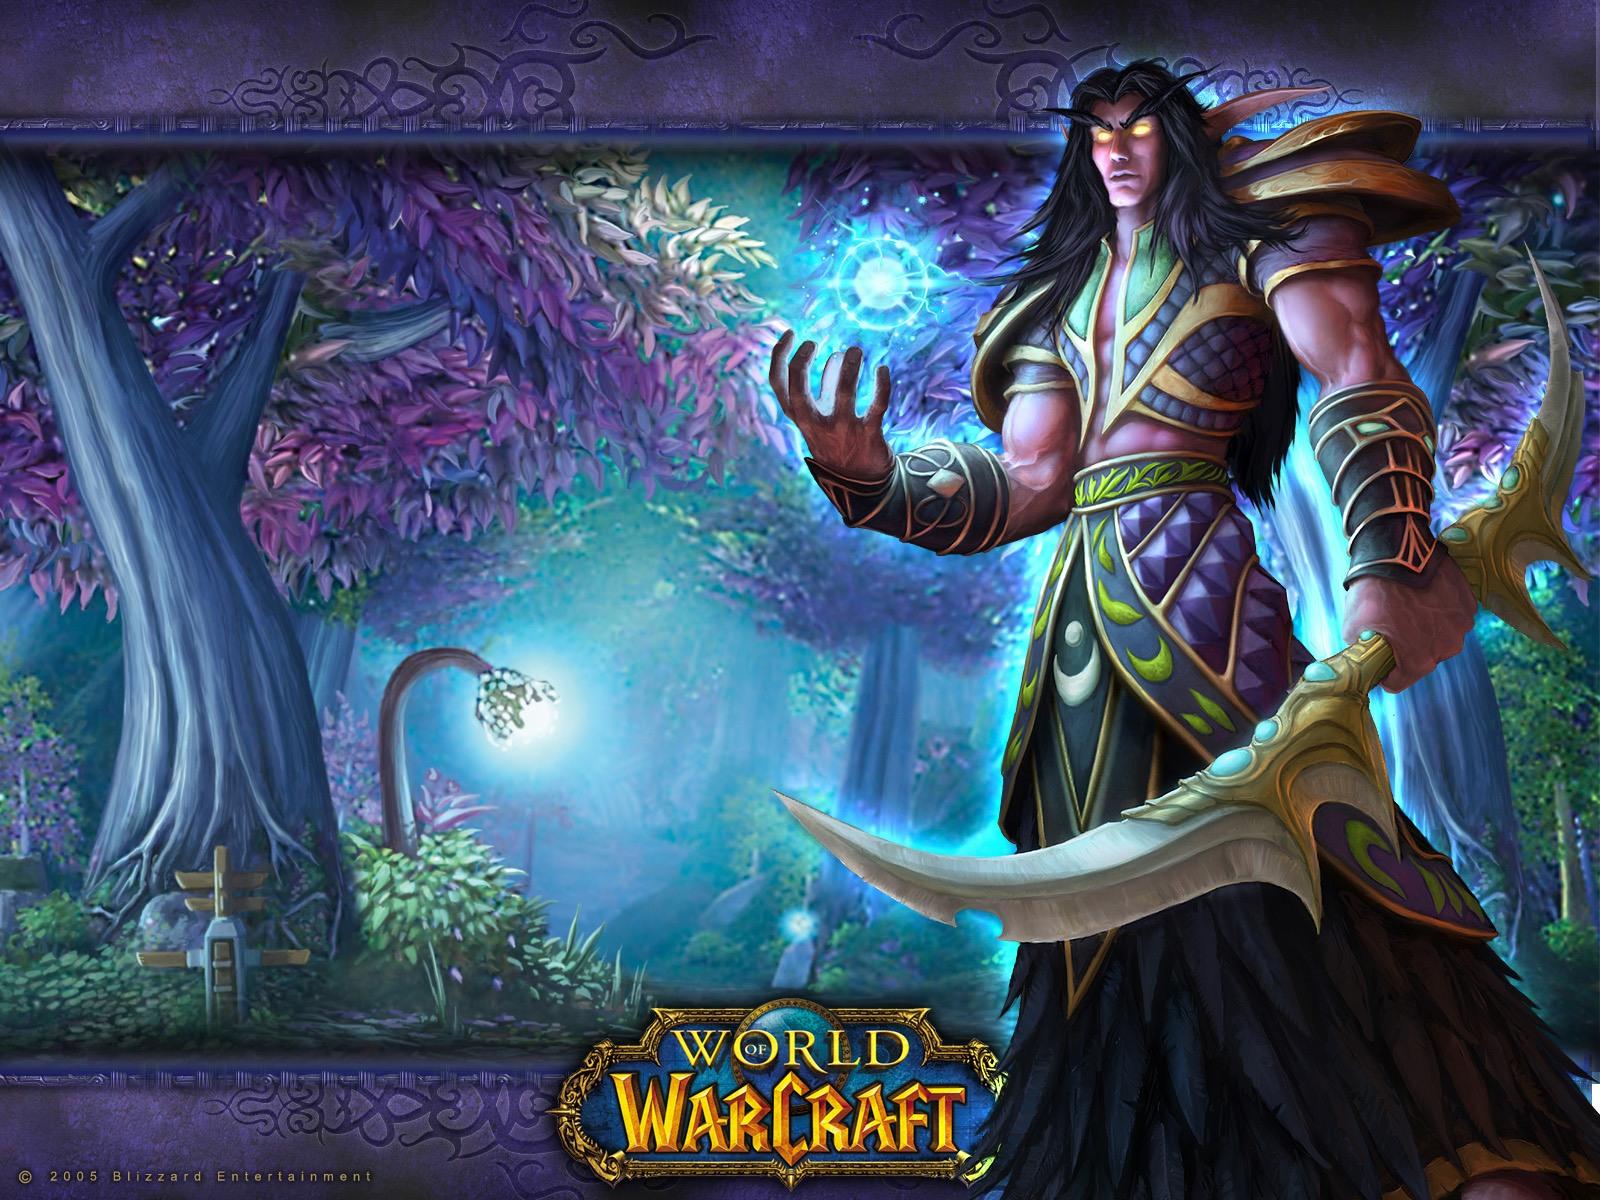 Free Download World Of Warcraft Night Elf Wallpaper 1600x1200